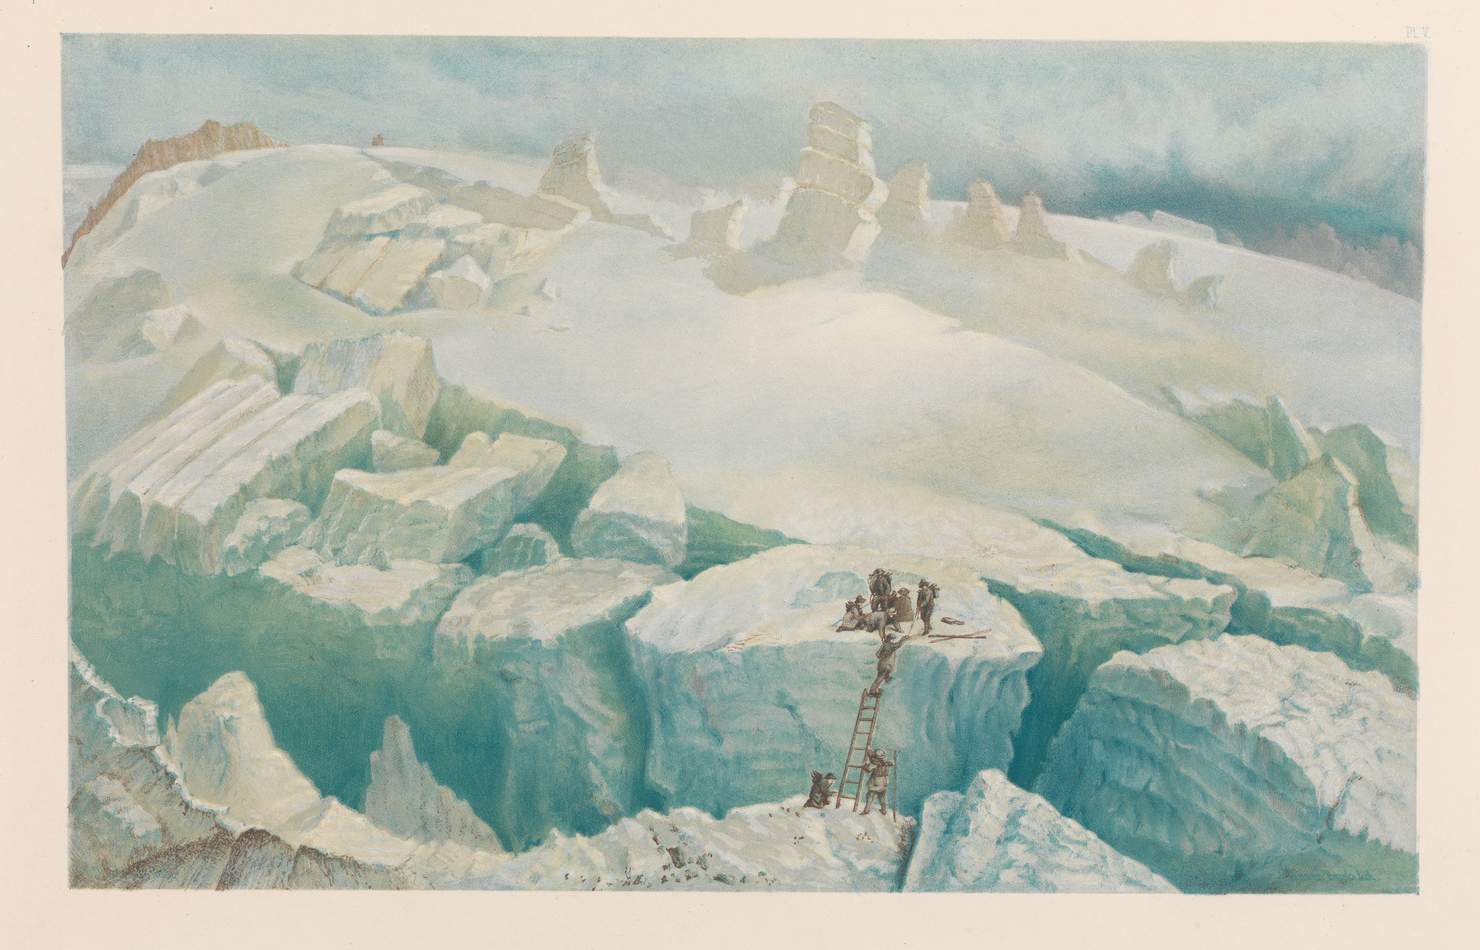 Upper Ice-World of Mont Blan